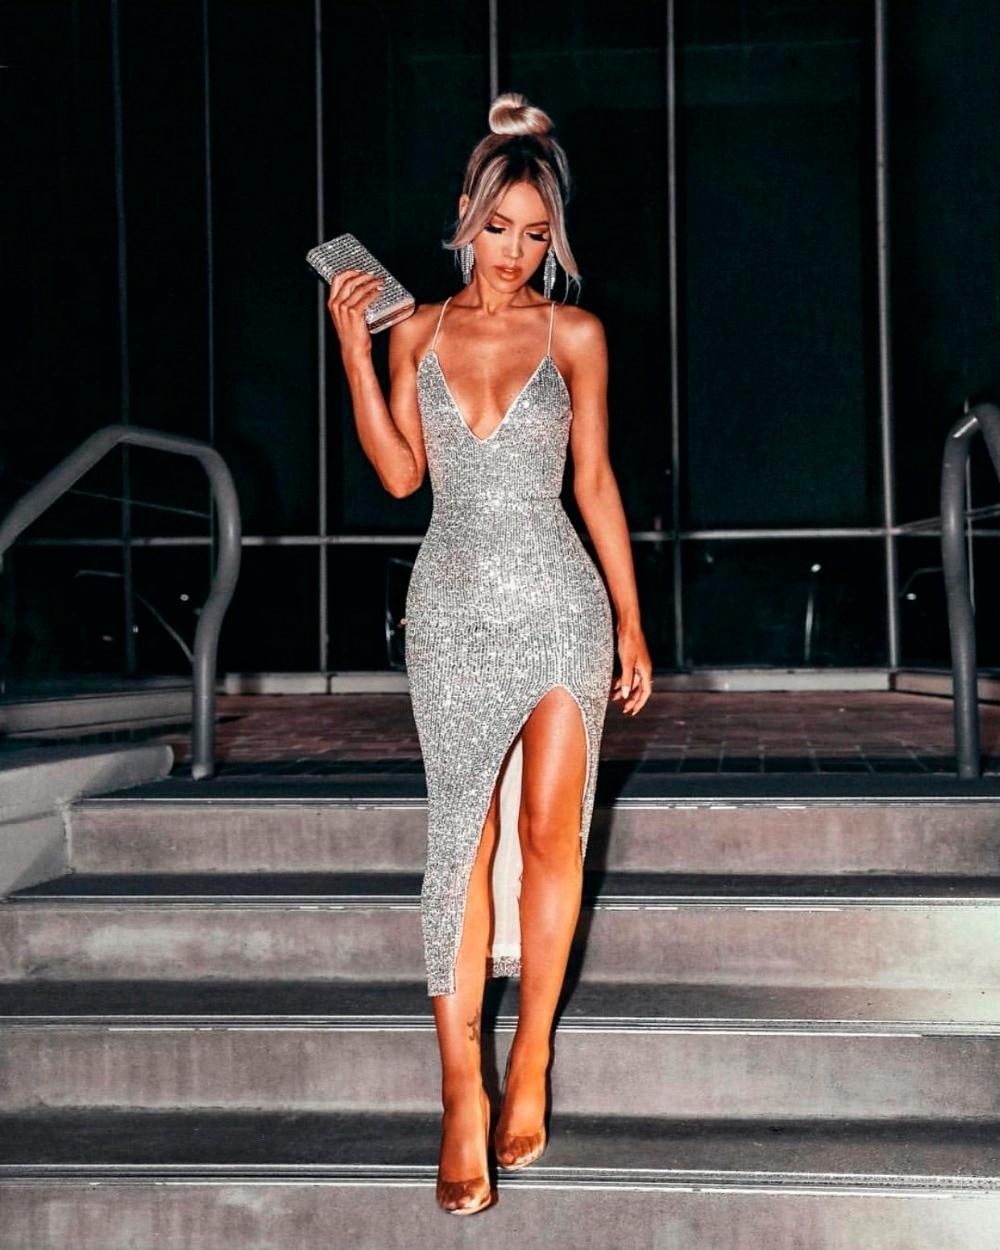 Vestidos Women Sexy Sequins Bling Silver Party Dress 2019 -5791